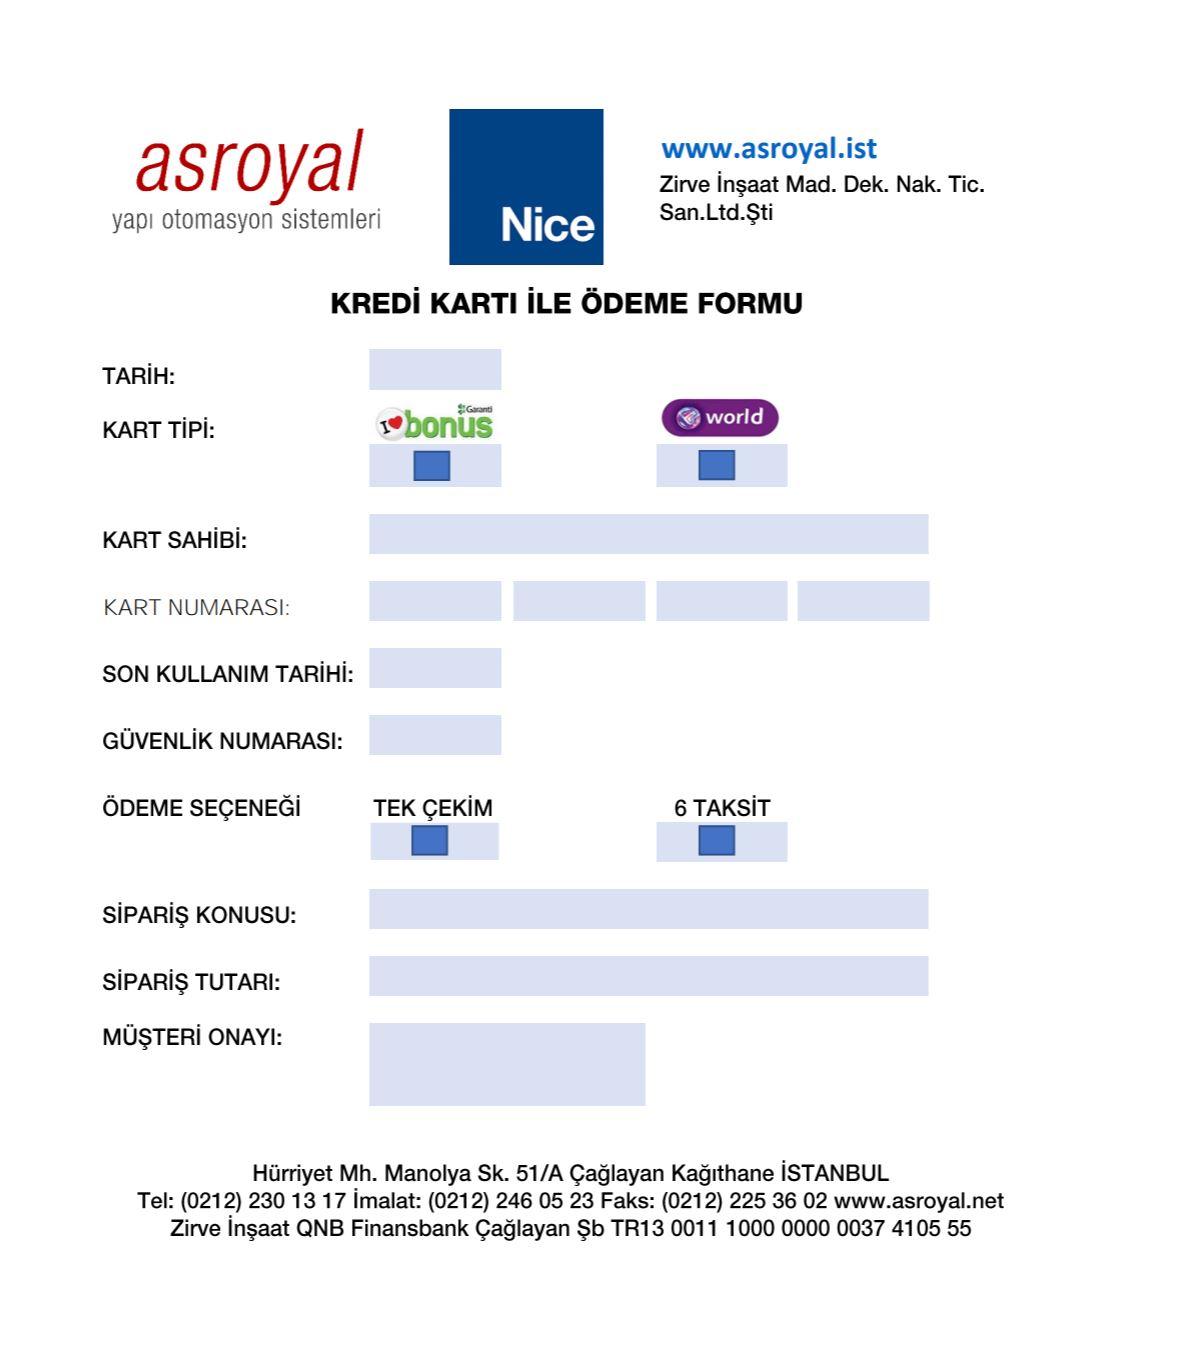 Nice Mail Order formu